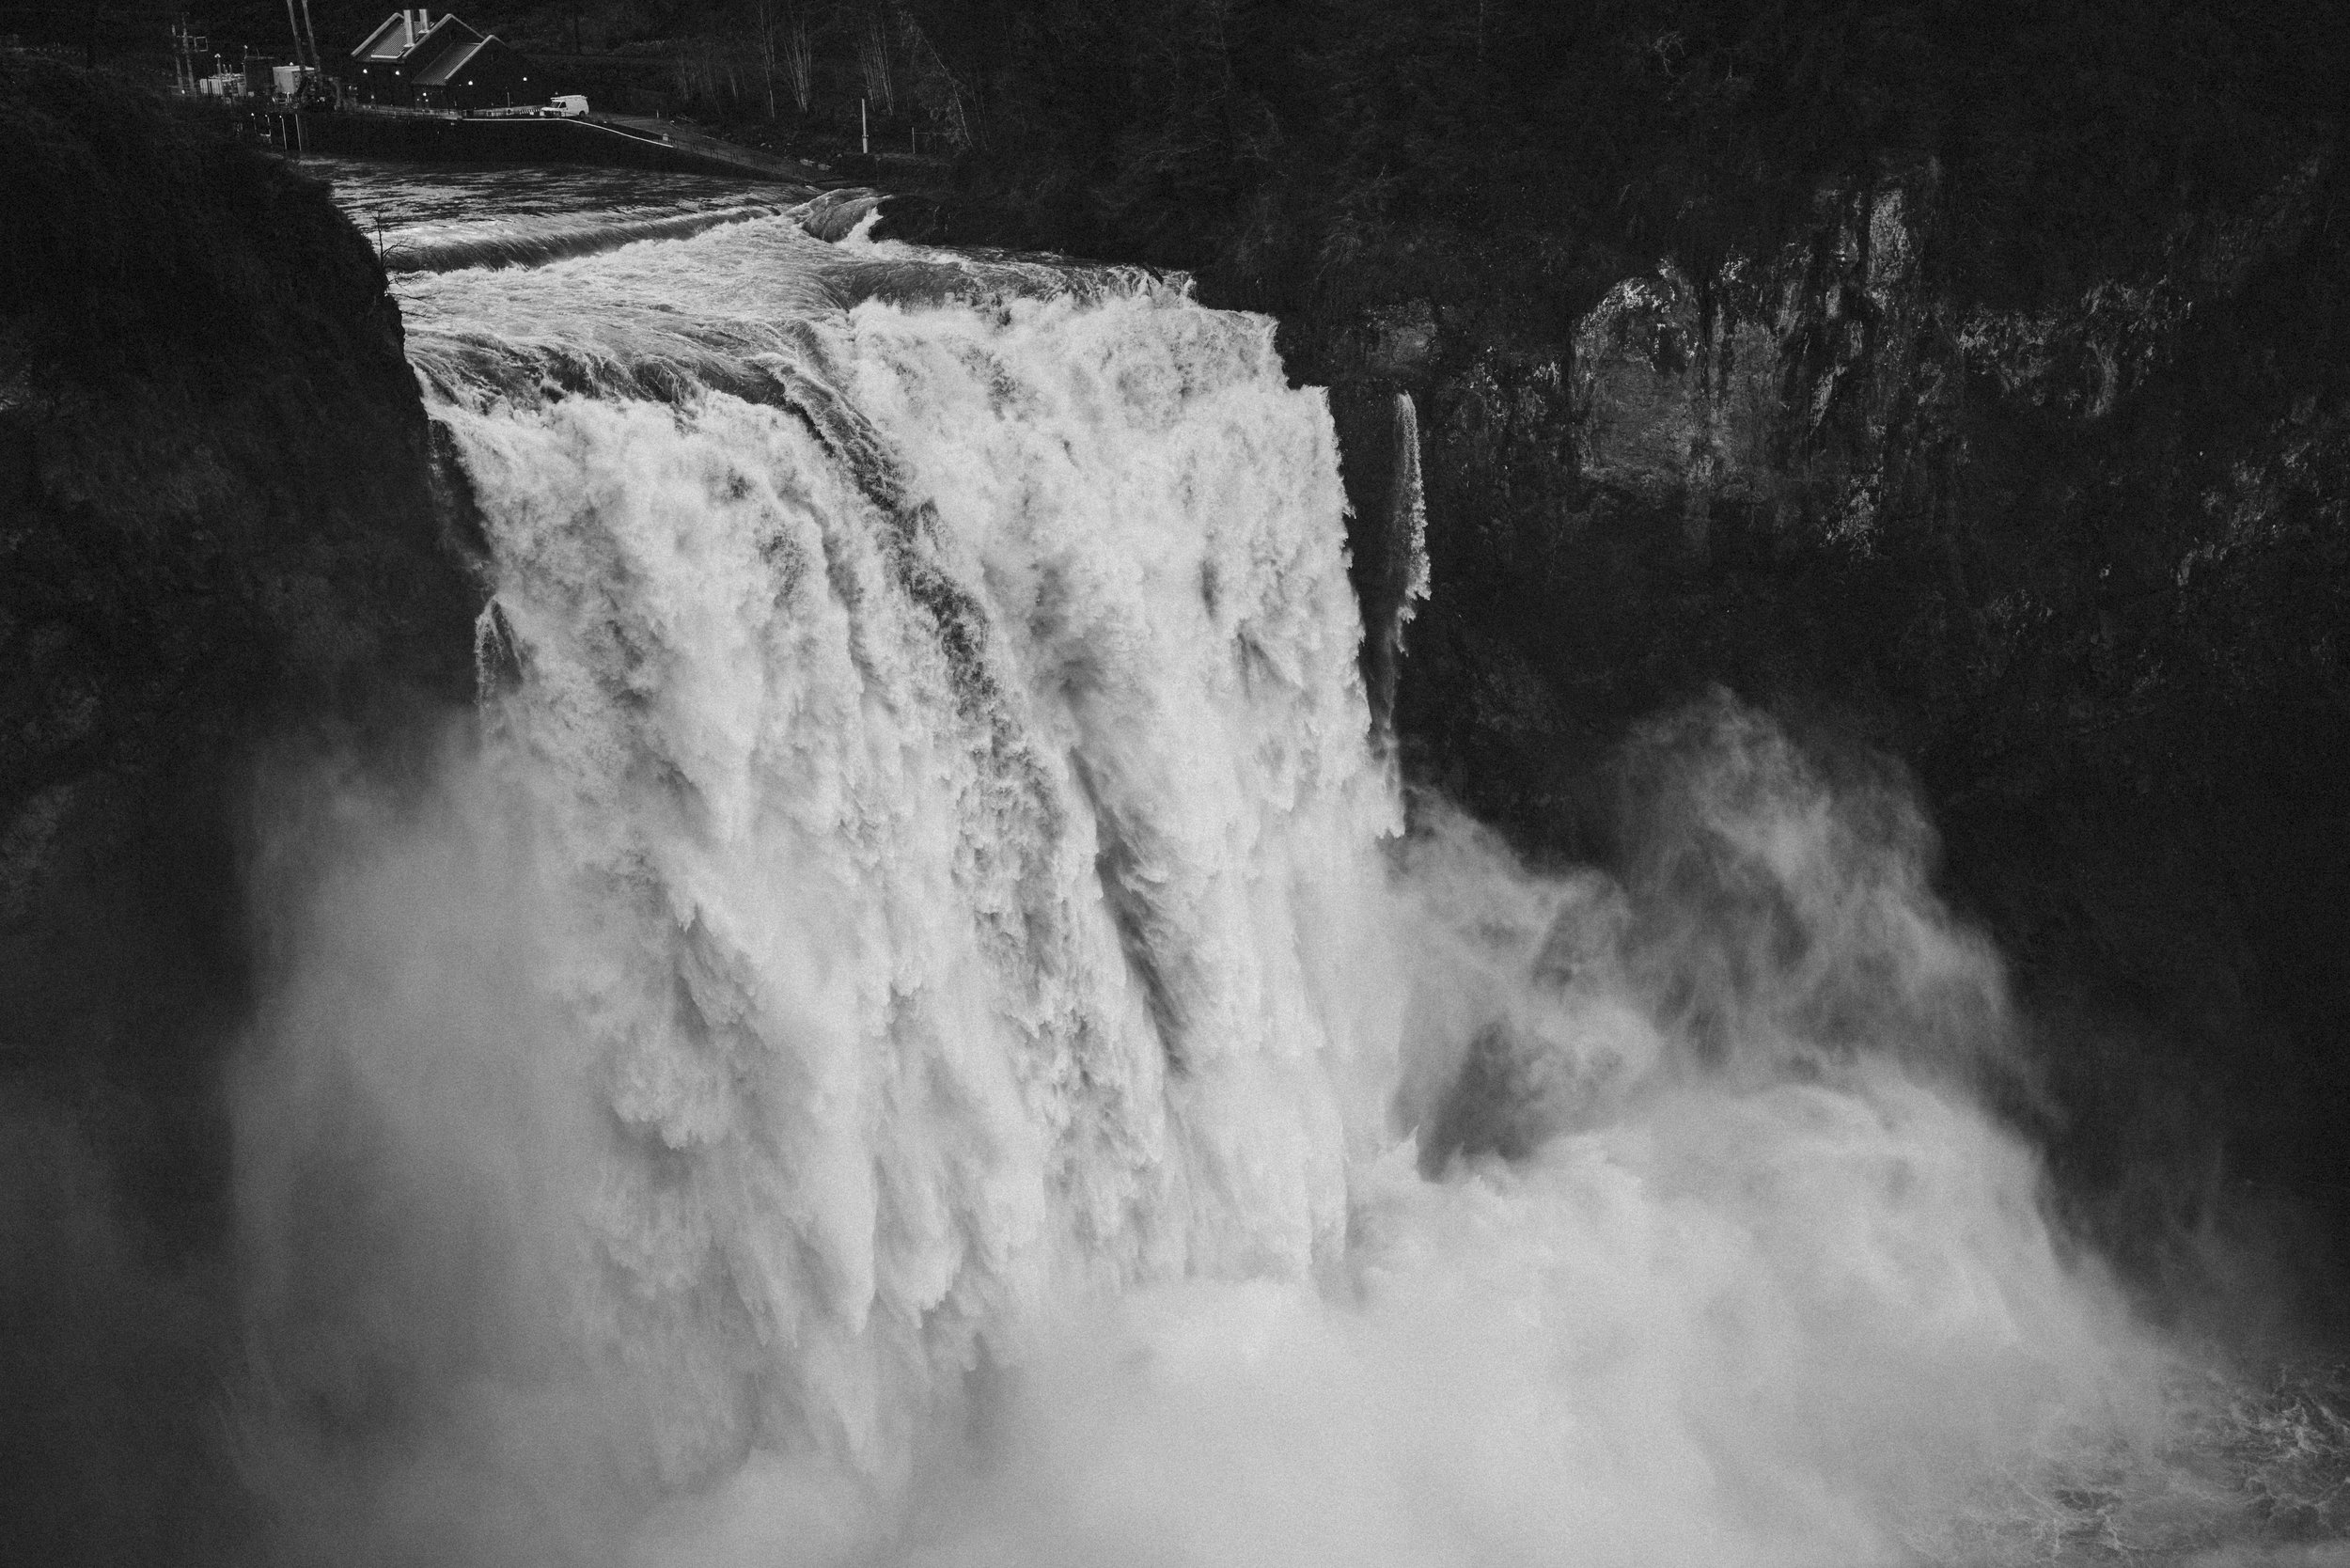 Snoqualmie Falls, Washington USA